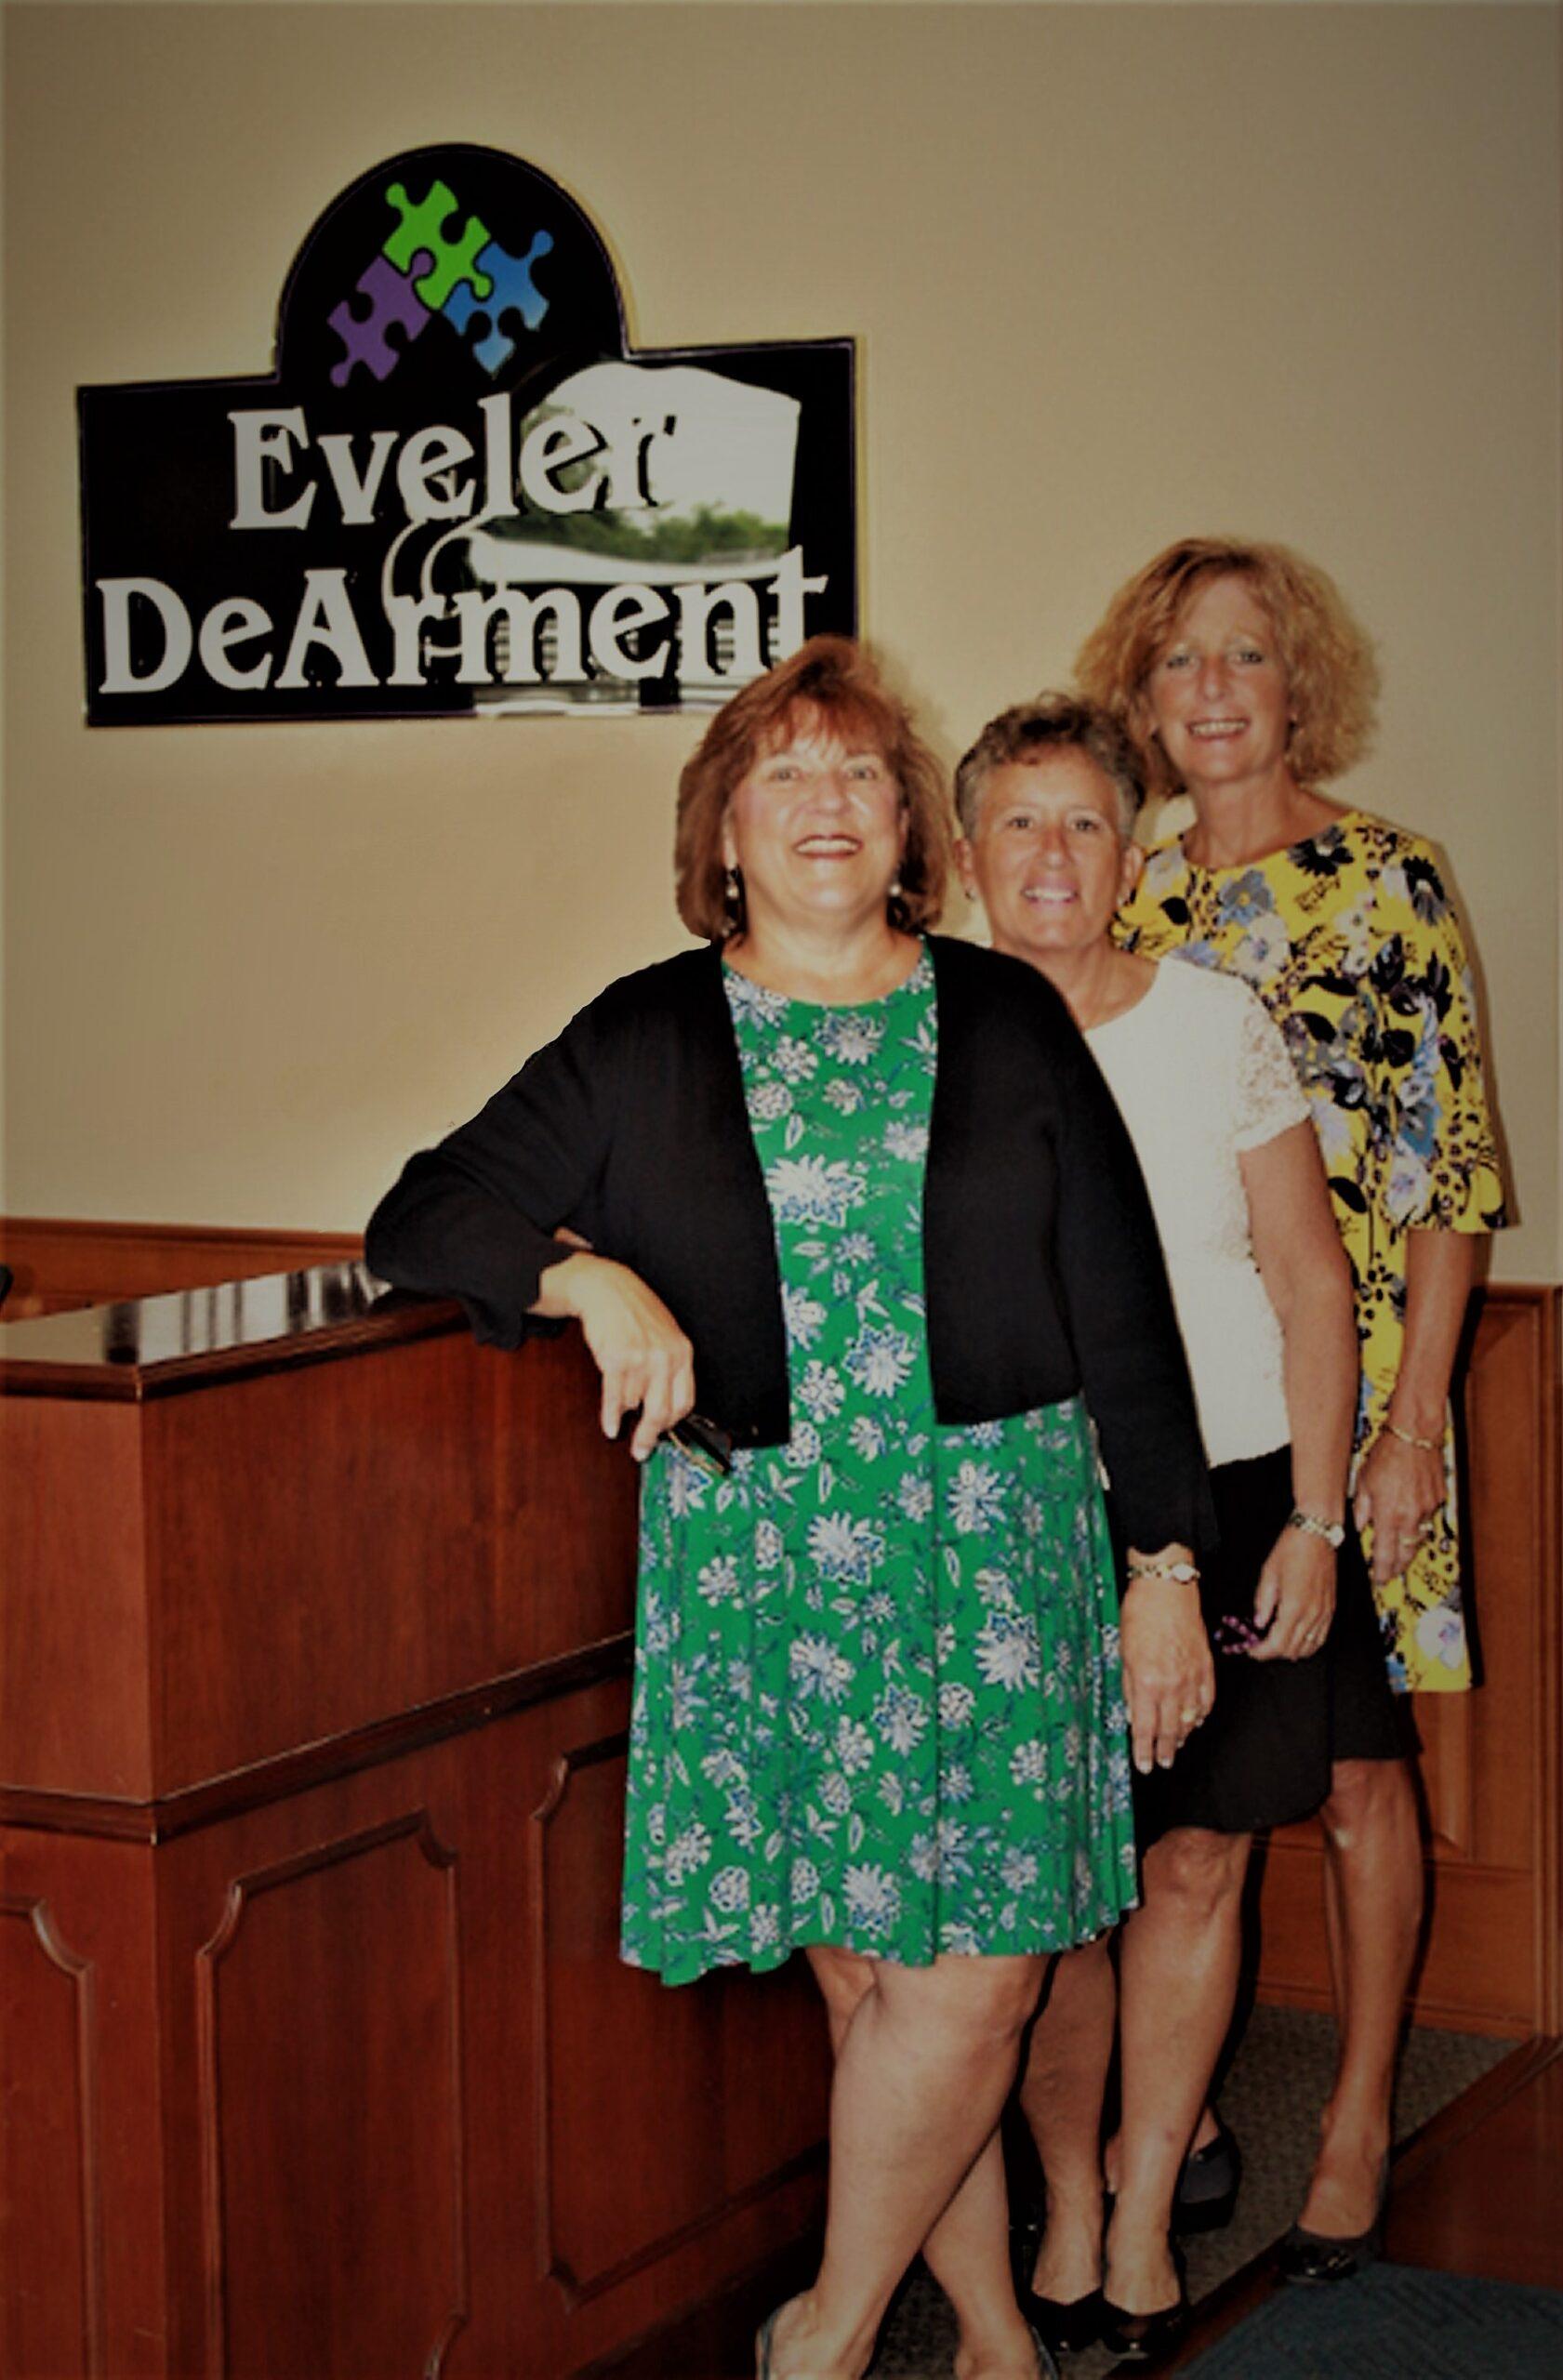 Eveler and DeArment Represent You